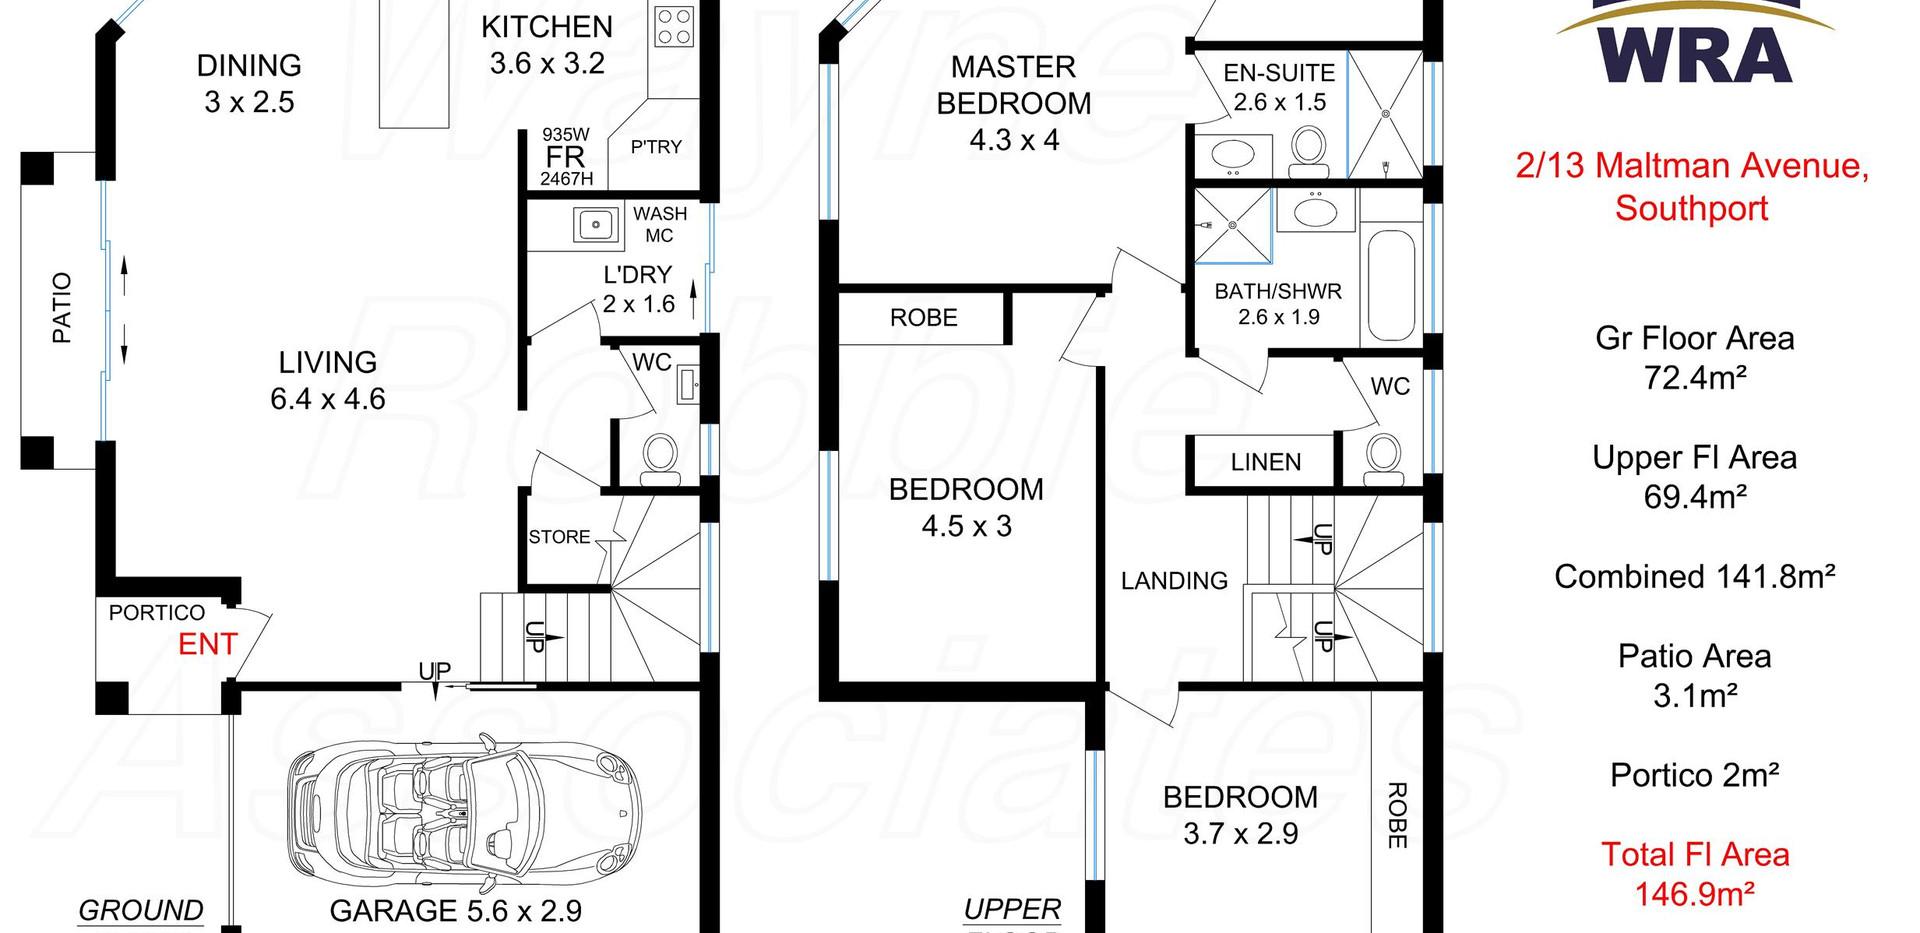 2-13 Maltman Avenue Southport Floor Plan